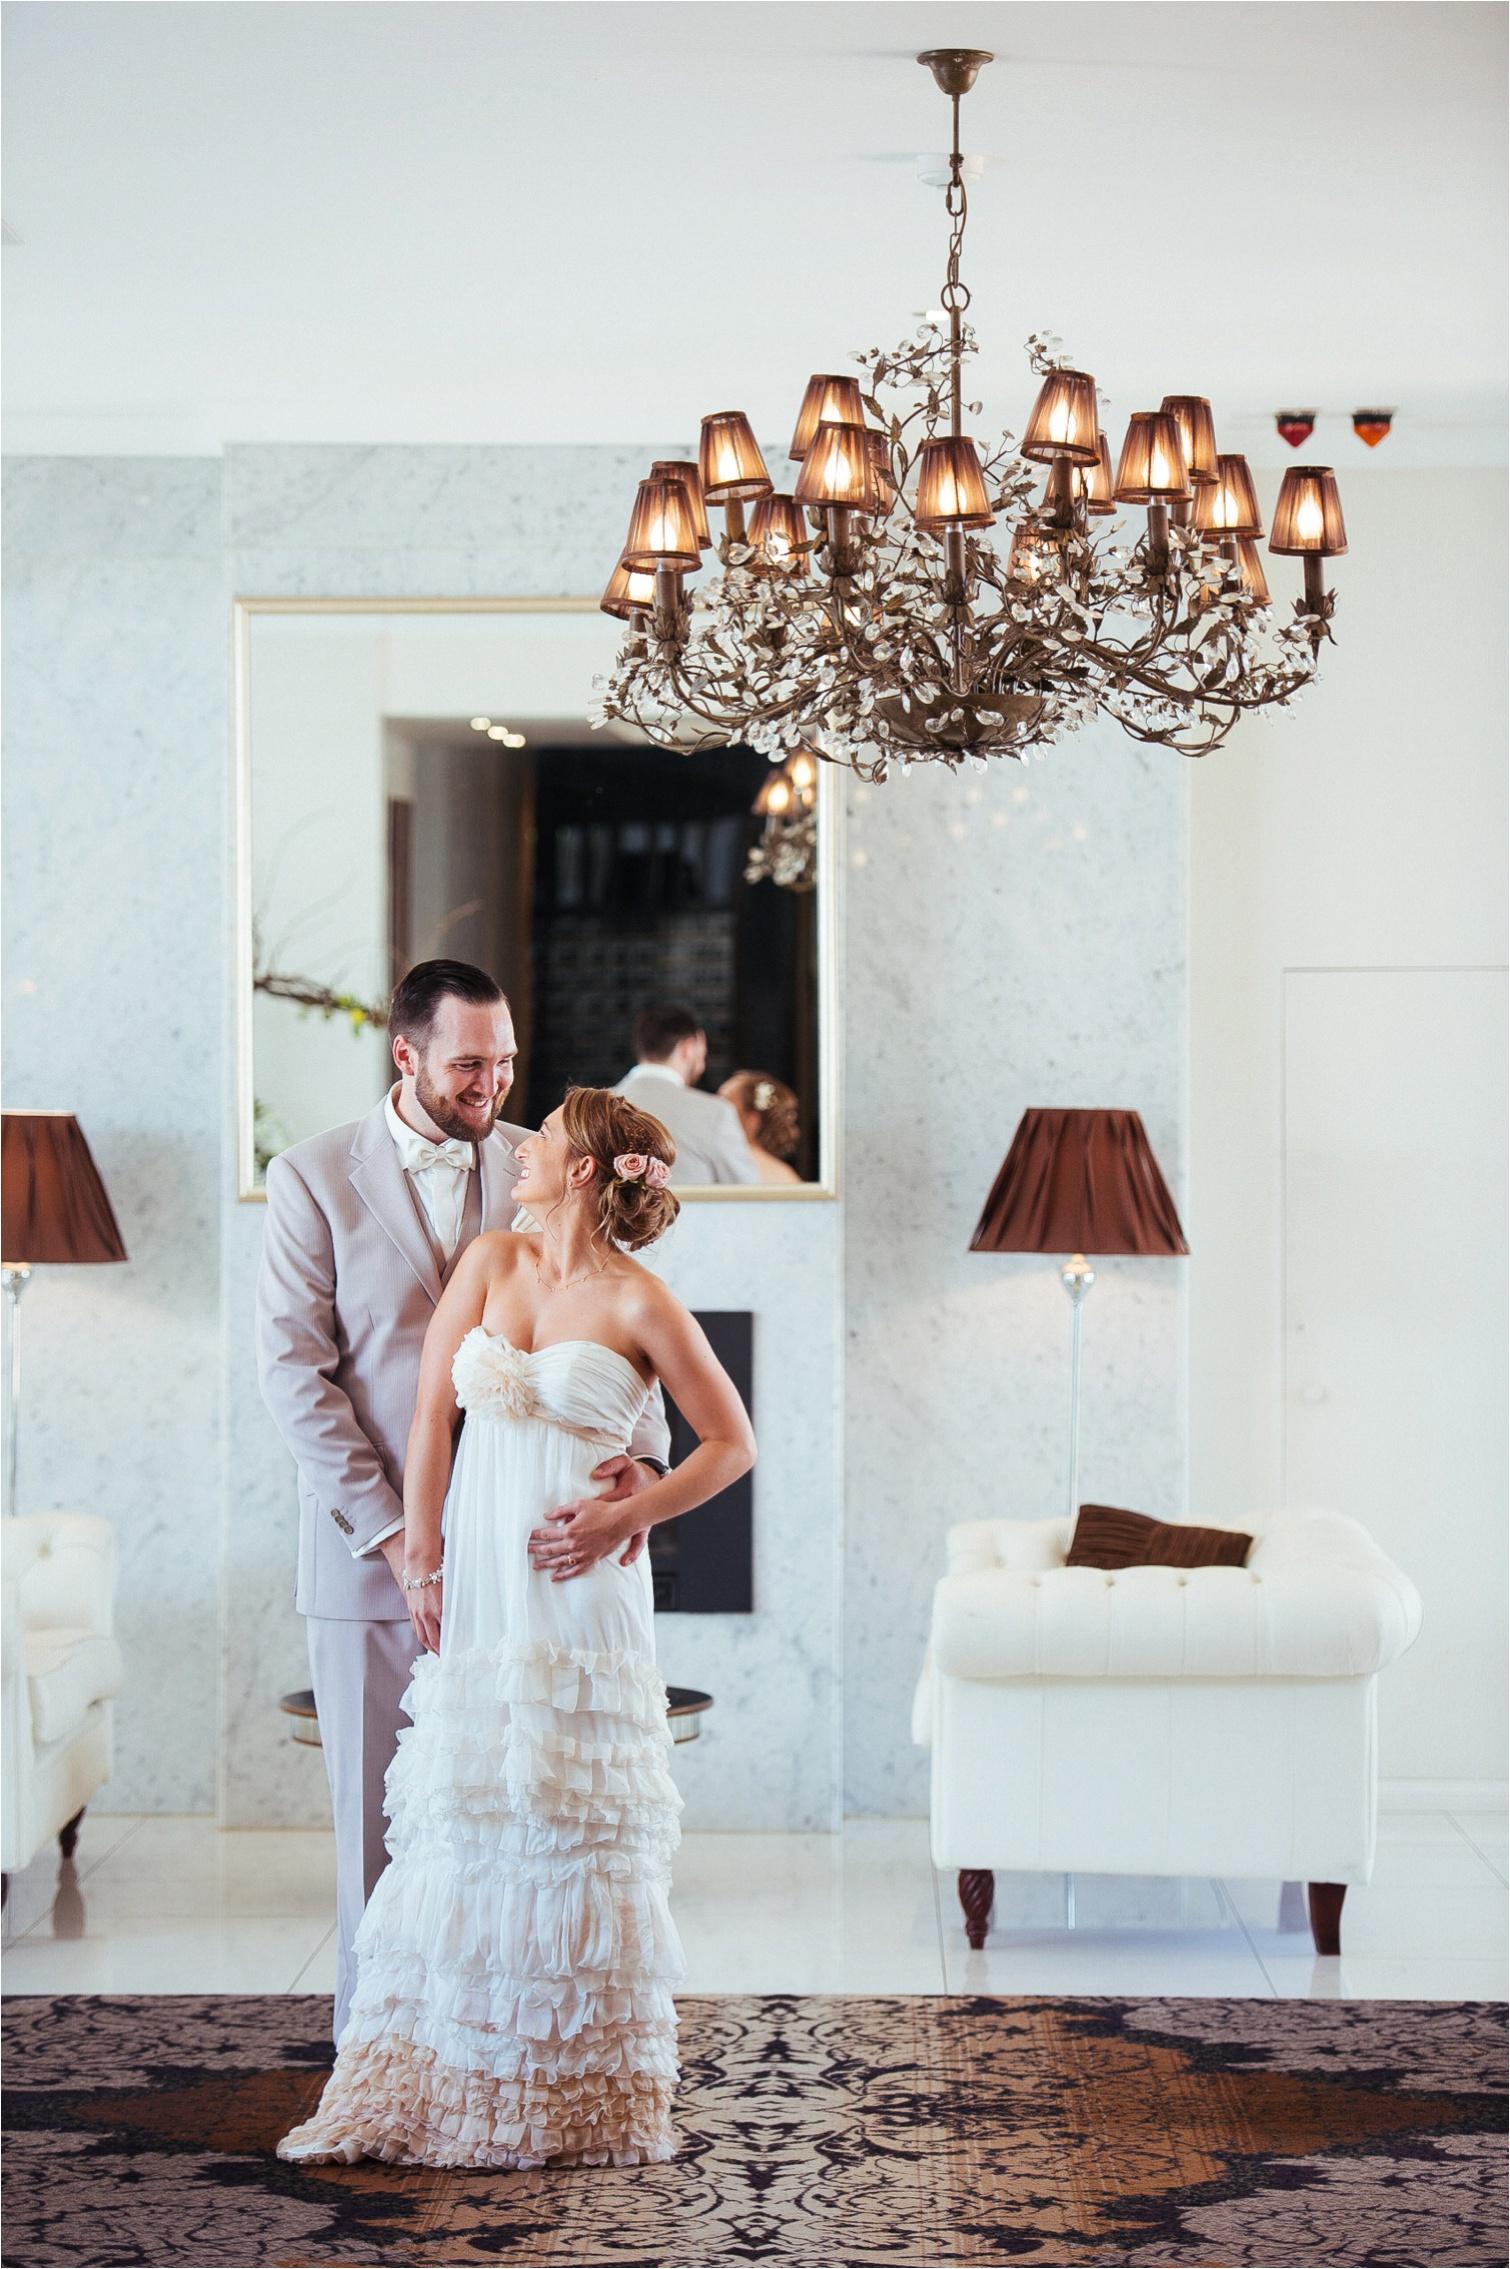 Jenny&Mitch_Sebel_Windsor_Sydney_Polo_Club_wedding-by_The_Follans_Gold_Coast_Wedding_Photographers_0038.jpg